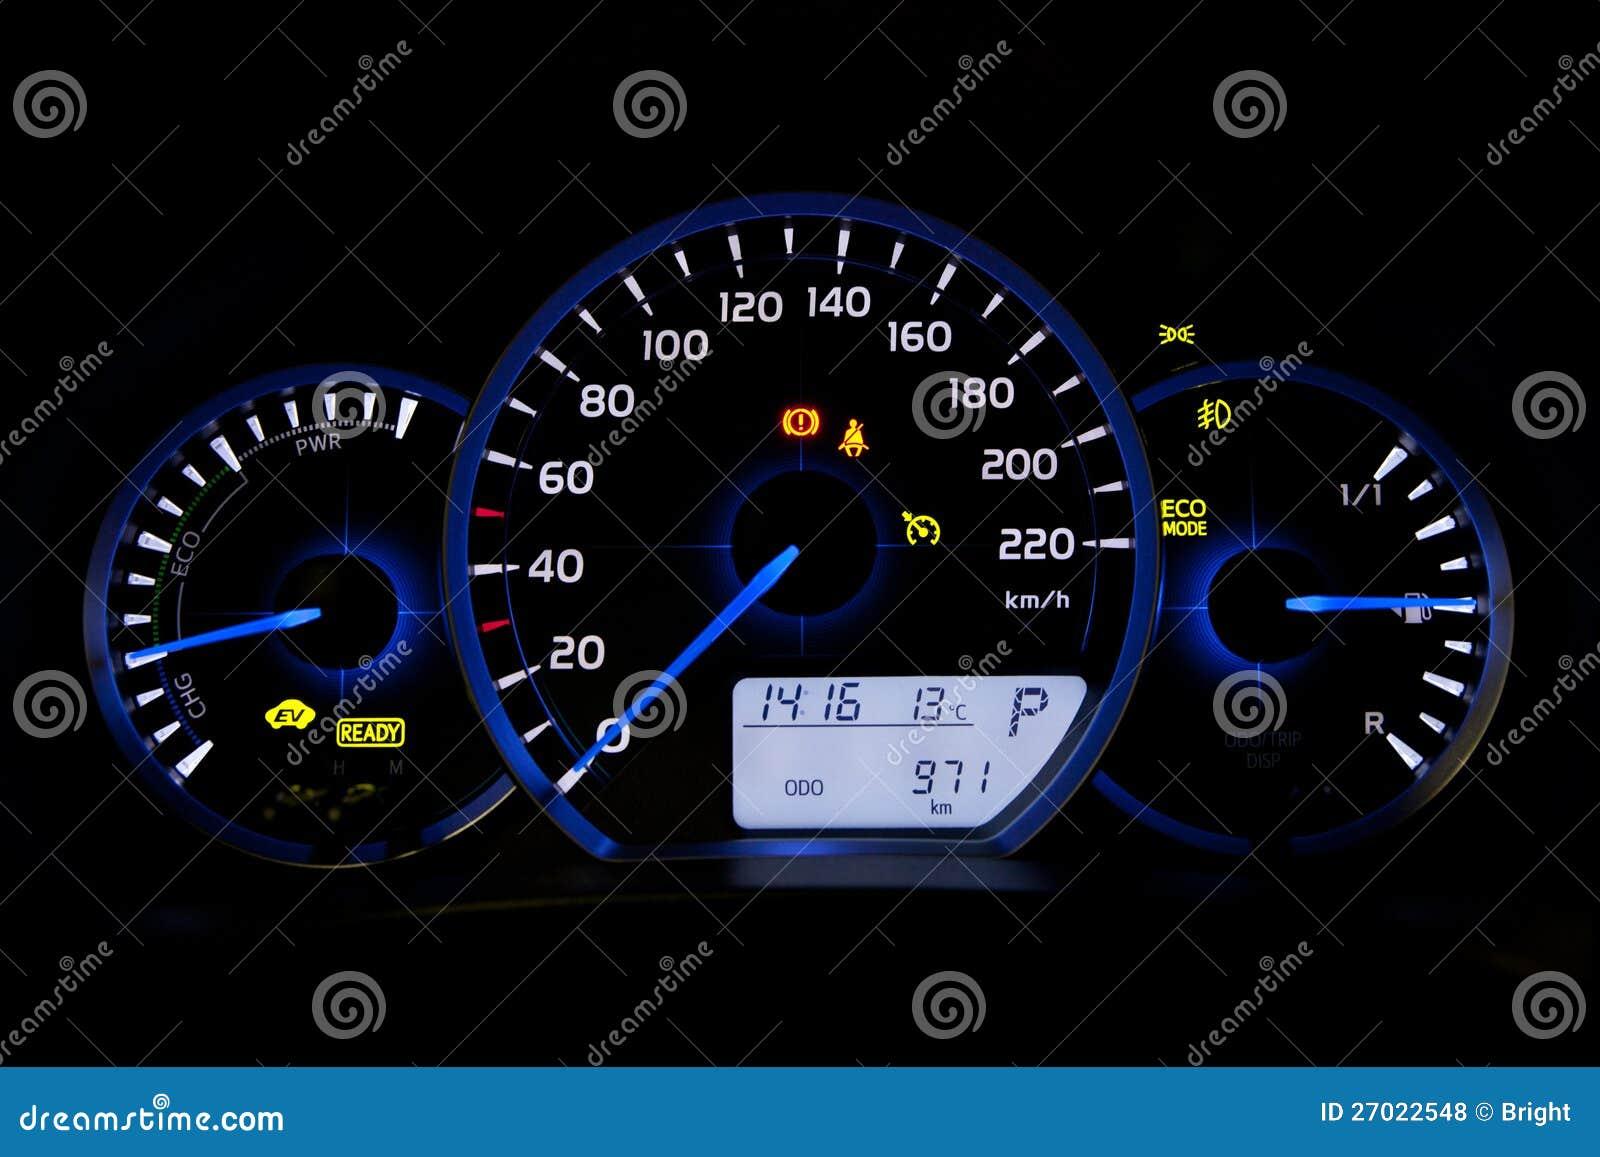 Car Cockpit Royalty Free Stock Photos - Image: 27022548 | {Auto cockpit 35}